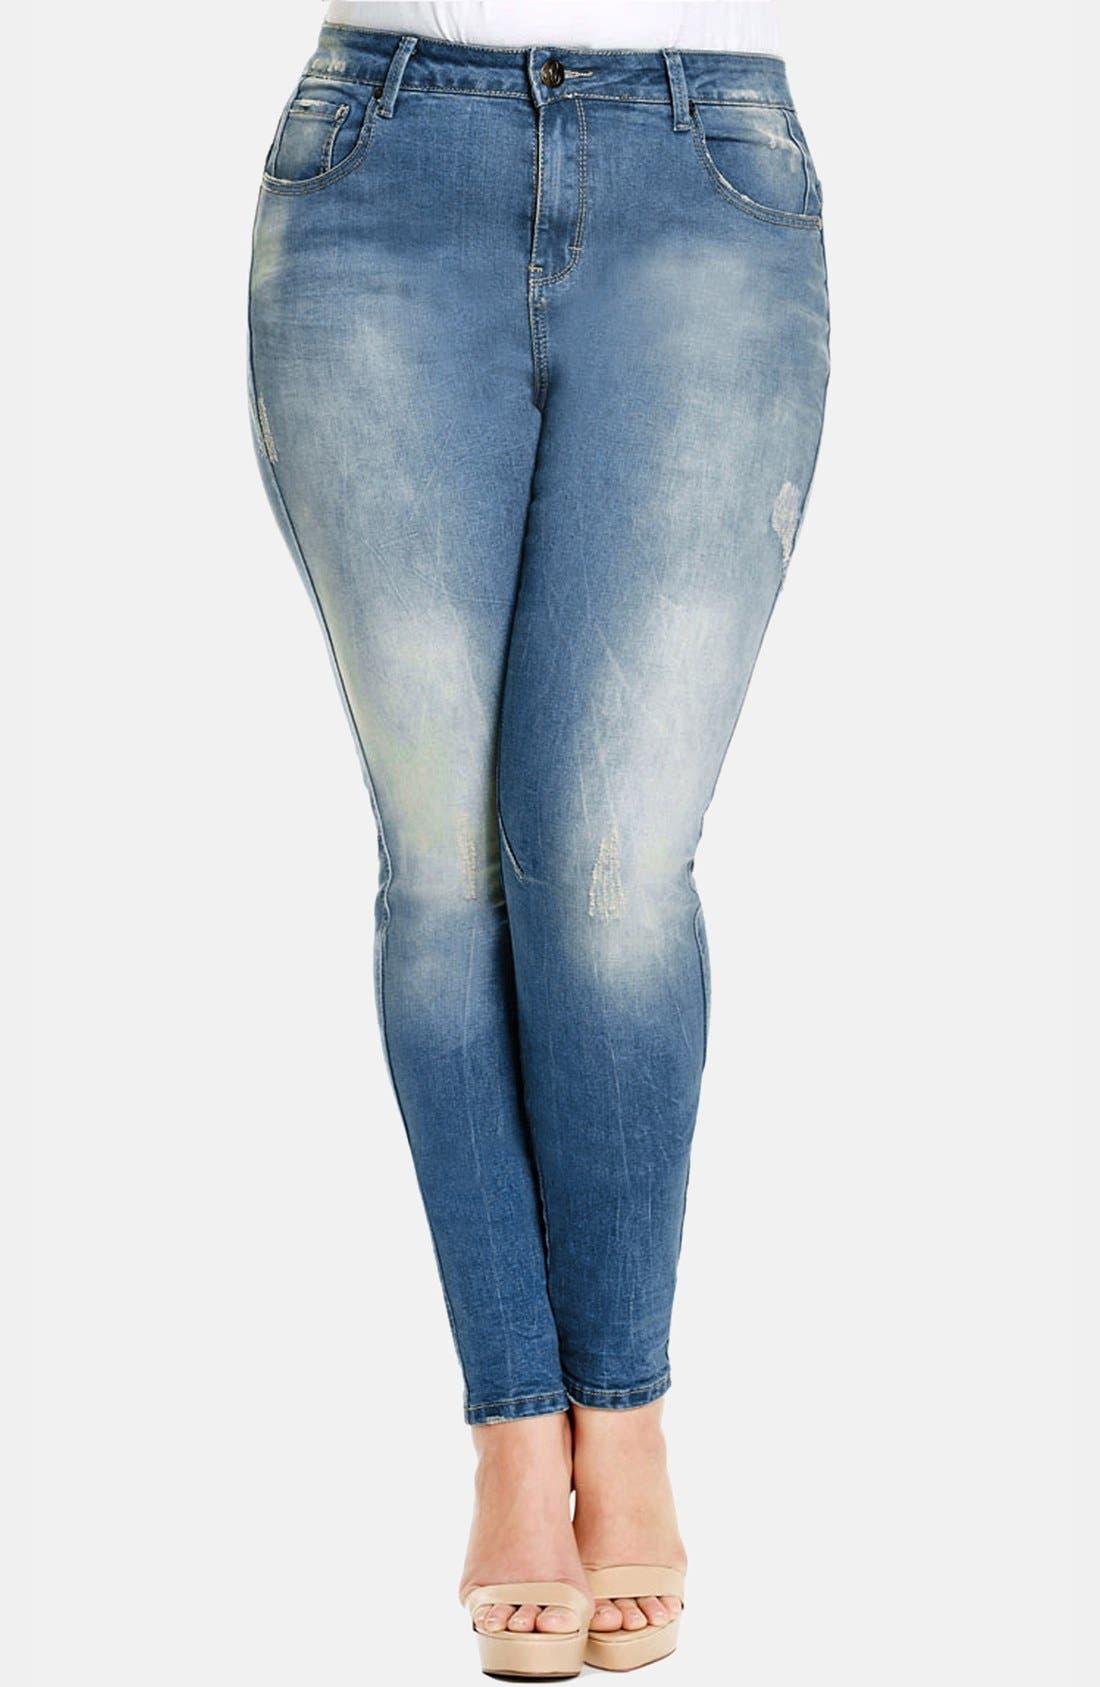 Alternate Image 1 Selected - City Chic Destructed Stretch Skinny Jeans (Light Denim) (Plus Size)